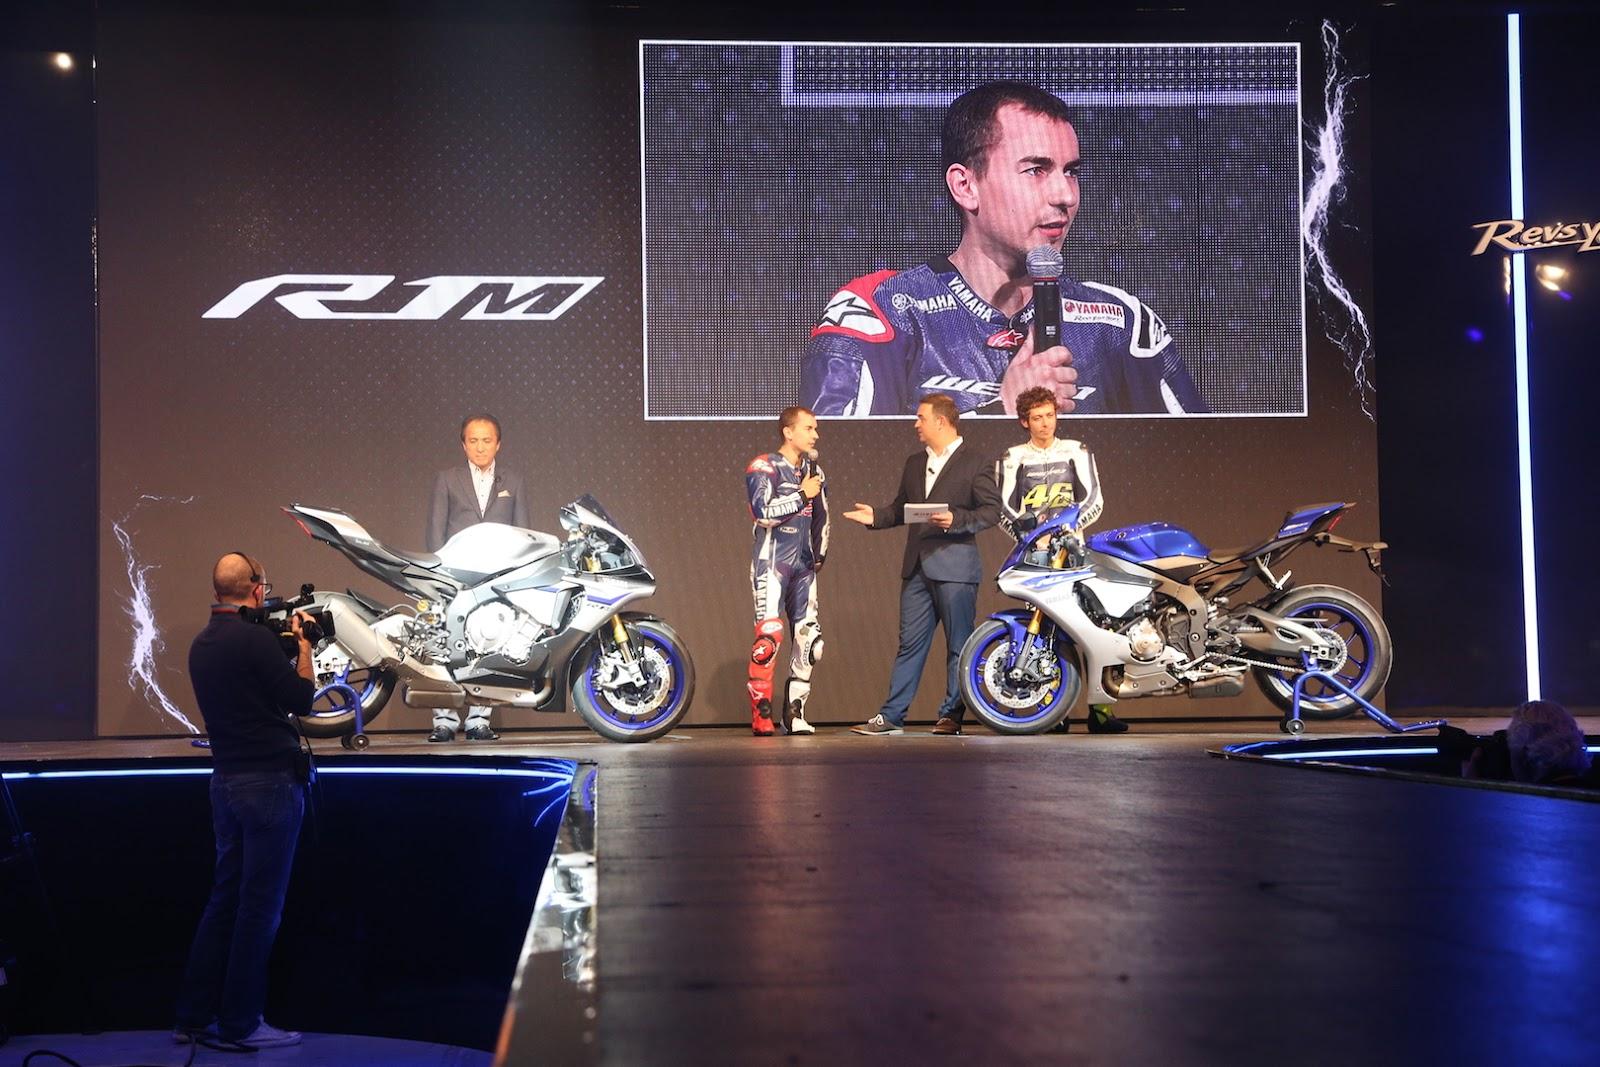 Moto Yamaha YZF R1 2015: Foto Video Scheda Tecnica